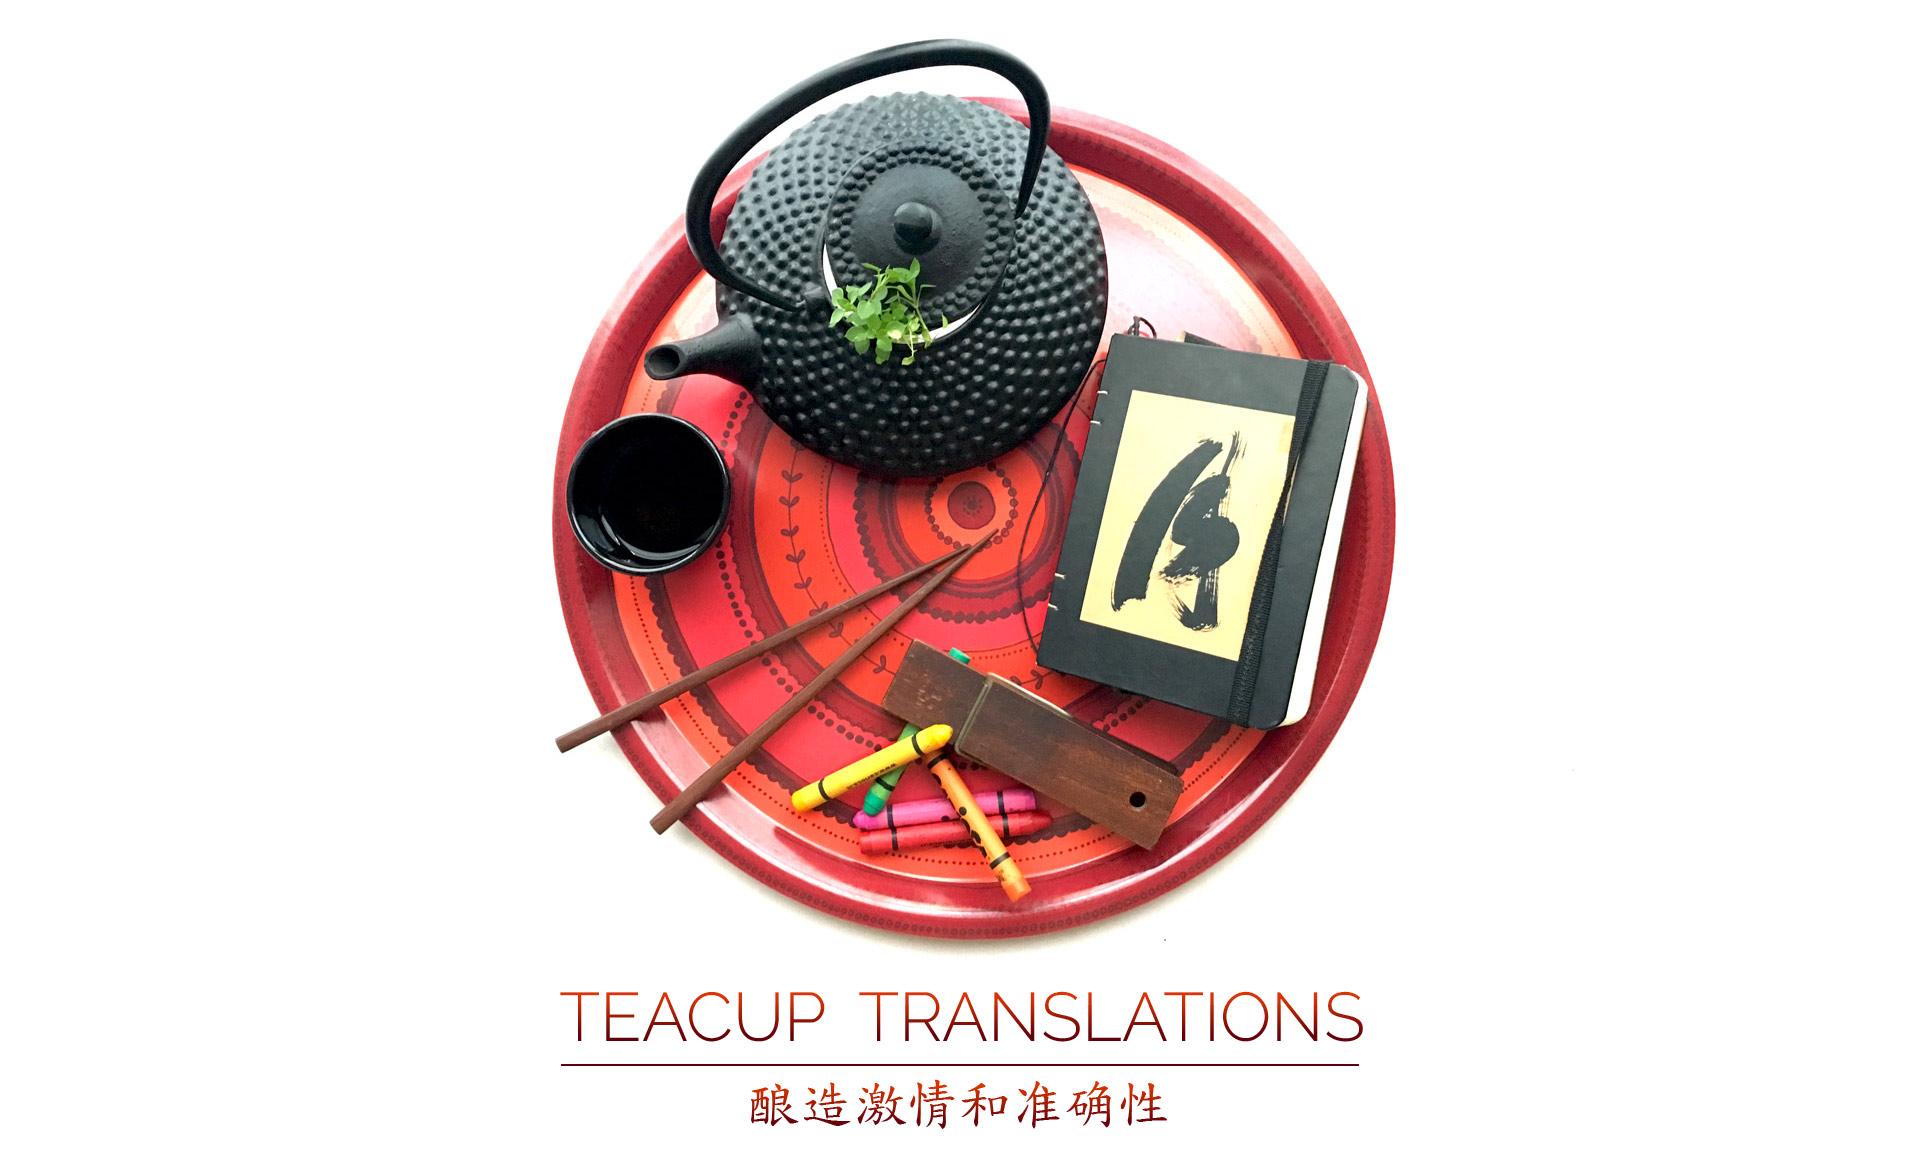 TeaCup Translations是一家提供笔译、语言课程和商务咨询的语